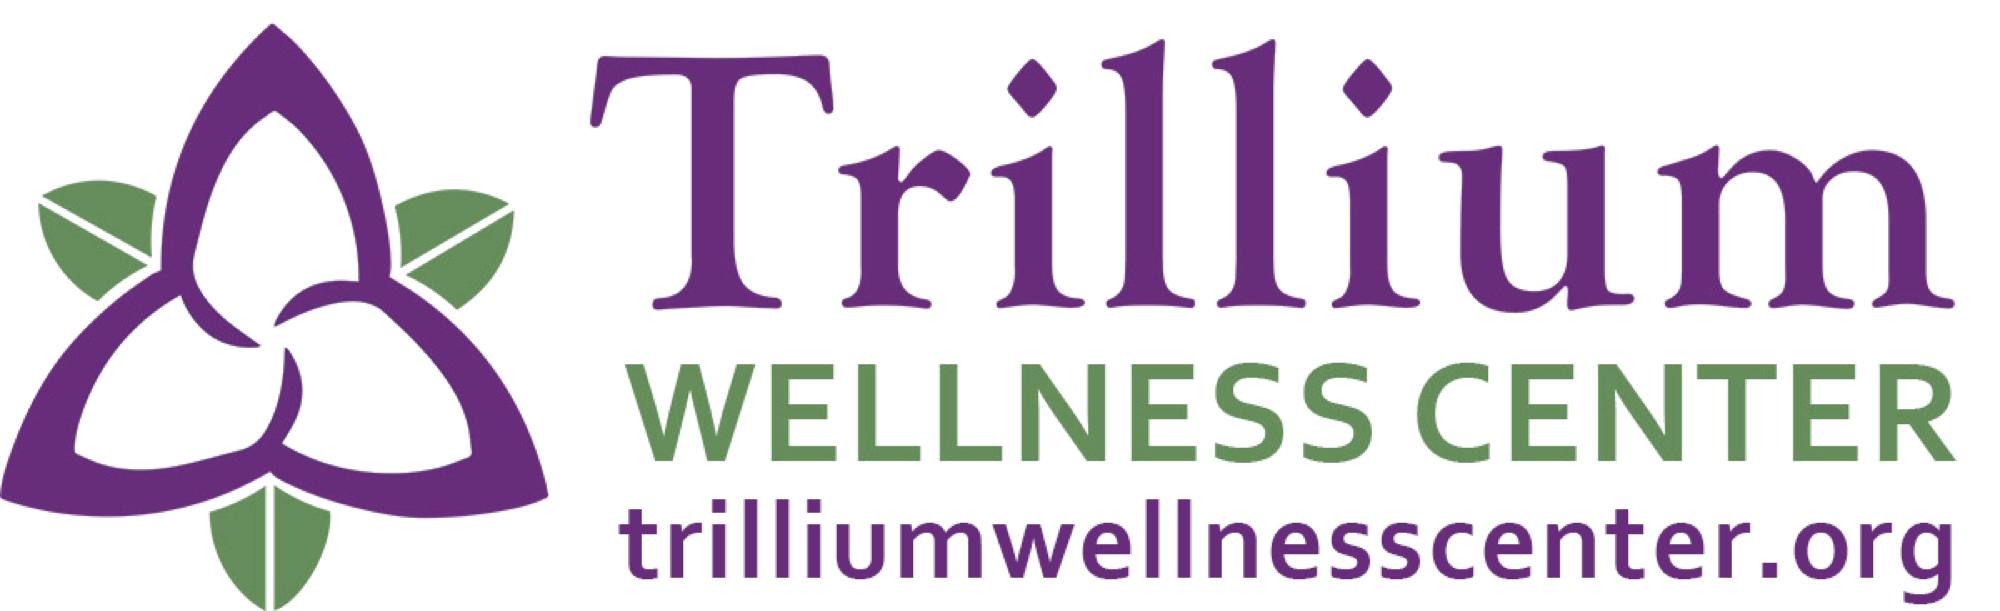 Trillium Wellness Center